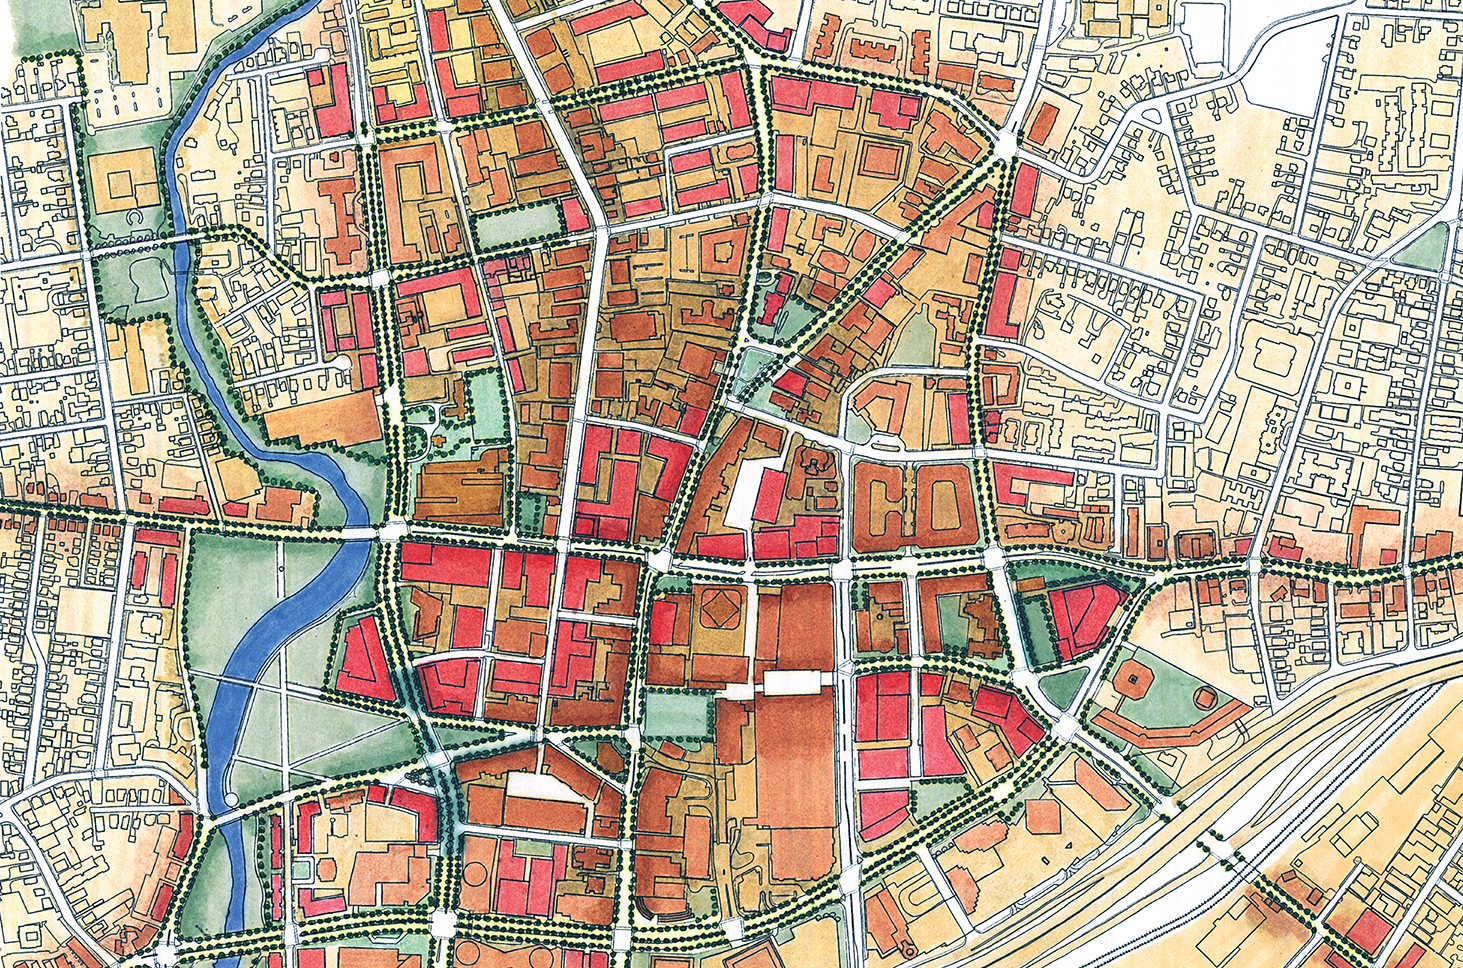 Stamford illustrative plan_re-sized